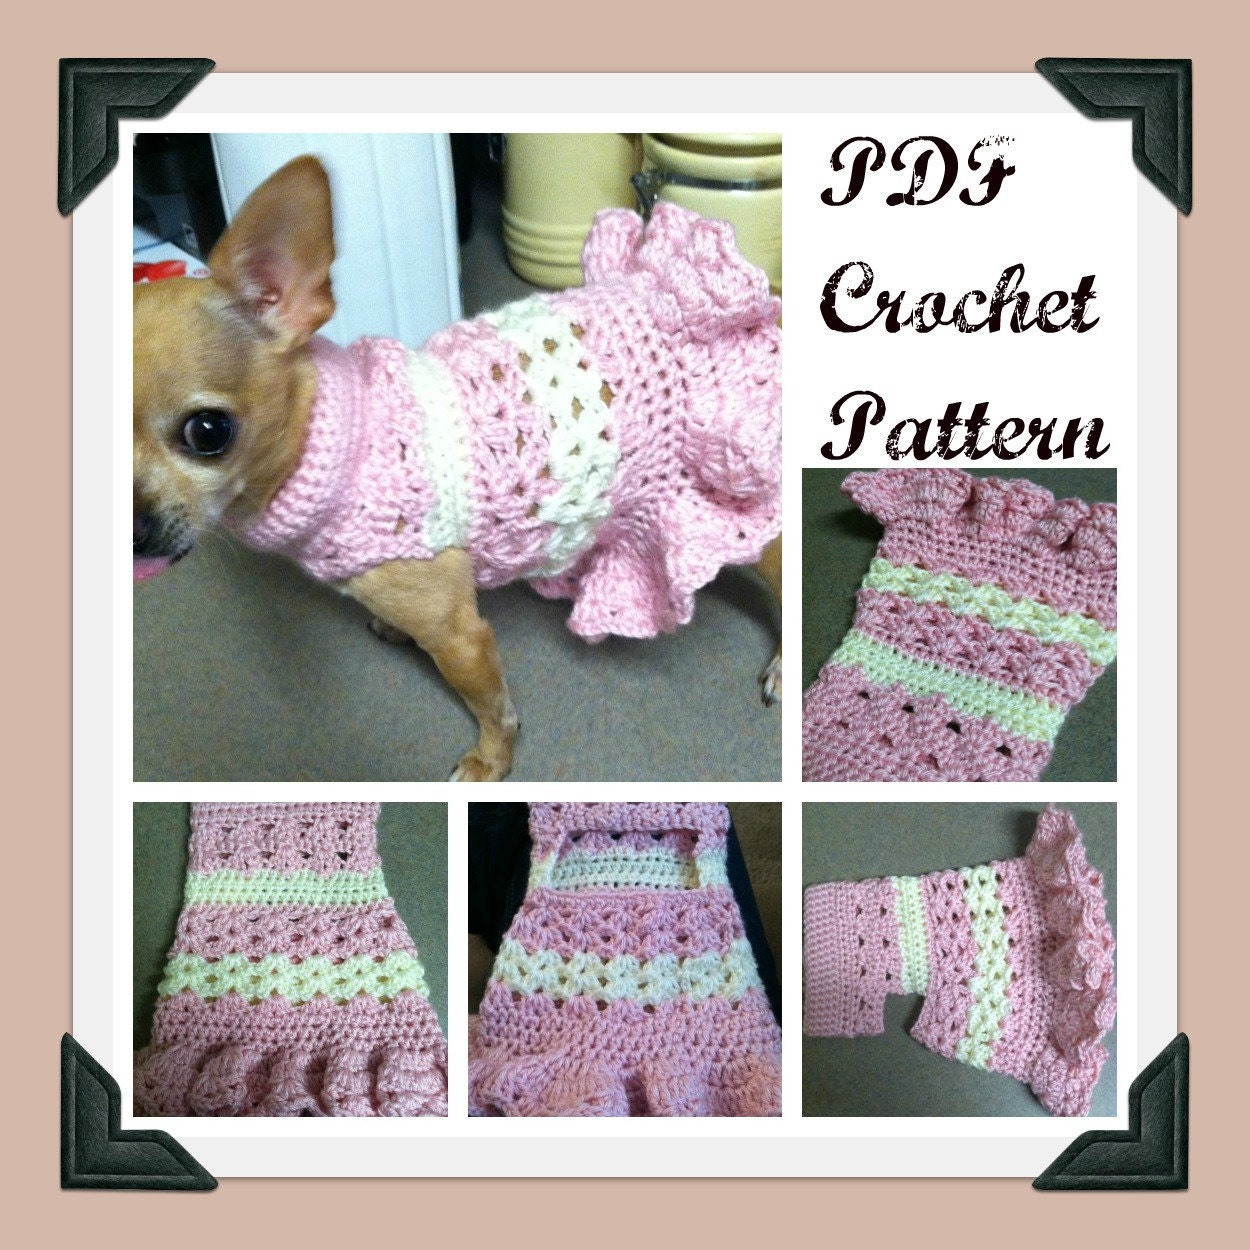 Crochet Dog Sweater Pattern Chihuahua : PDF Crochet Pattern Littlest Bo Peep Crochet Dog by ...